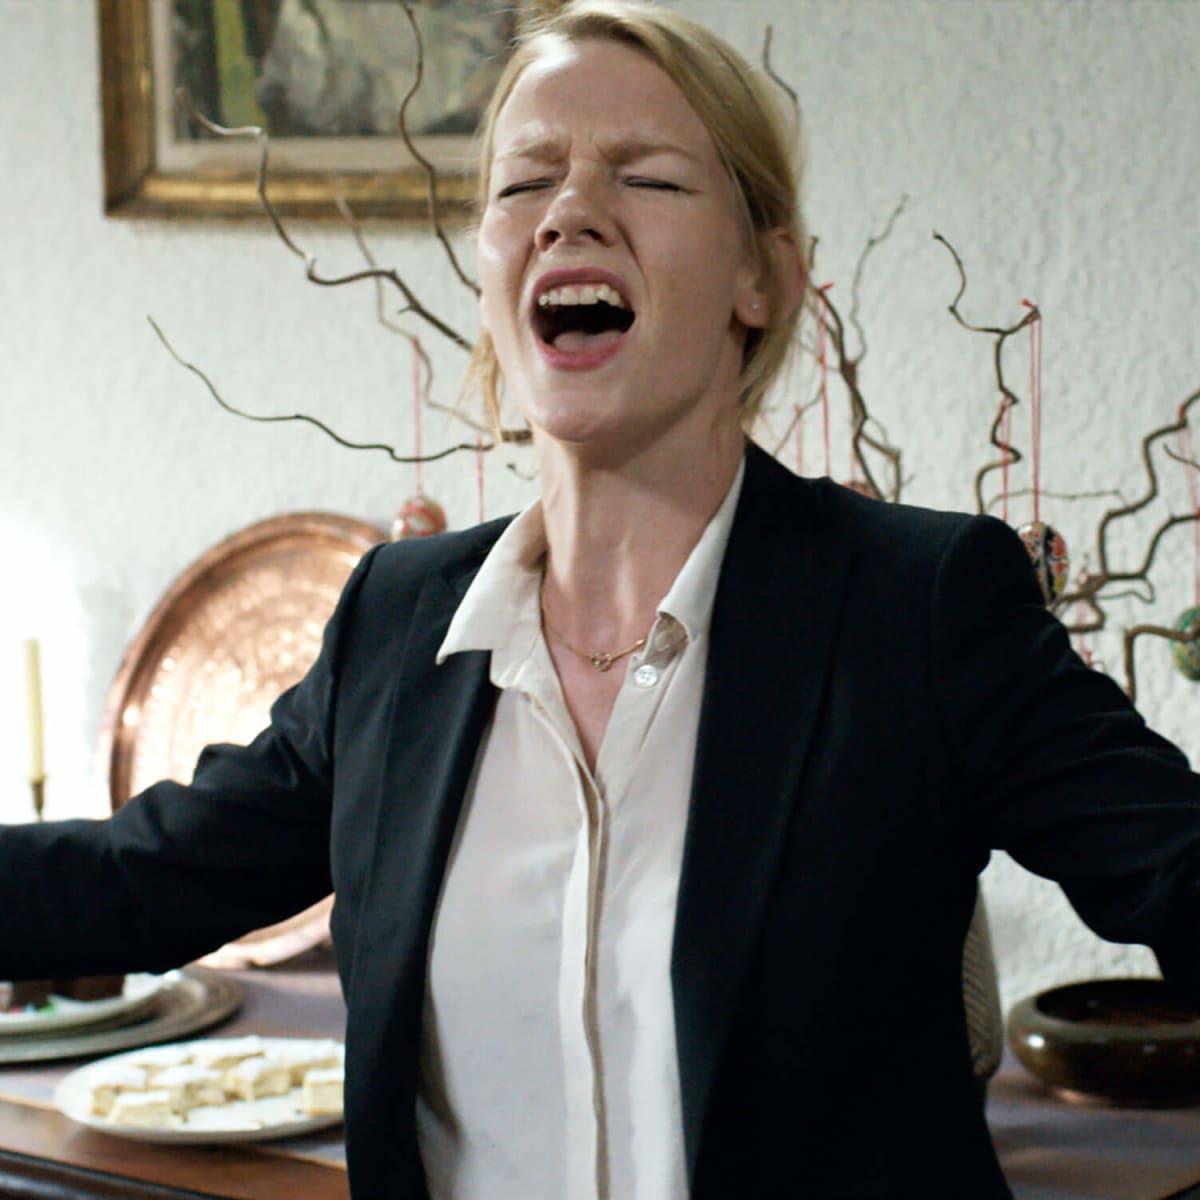 Magnolia at the Modern: Toni Erdmann